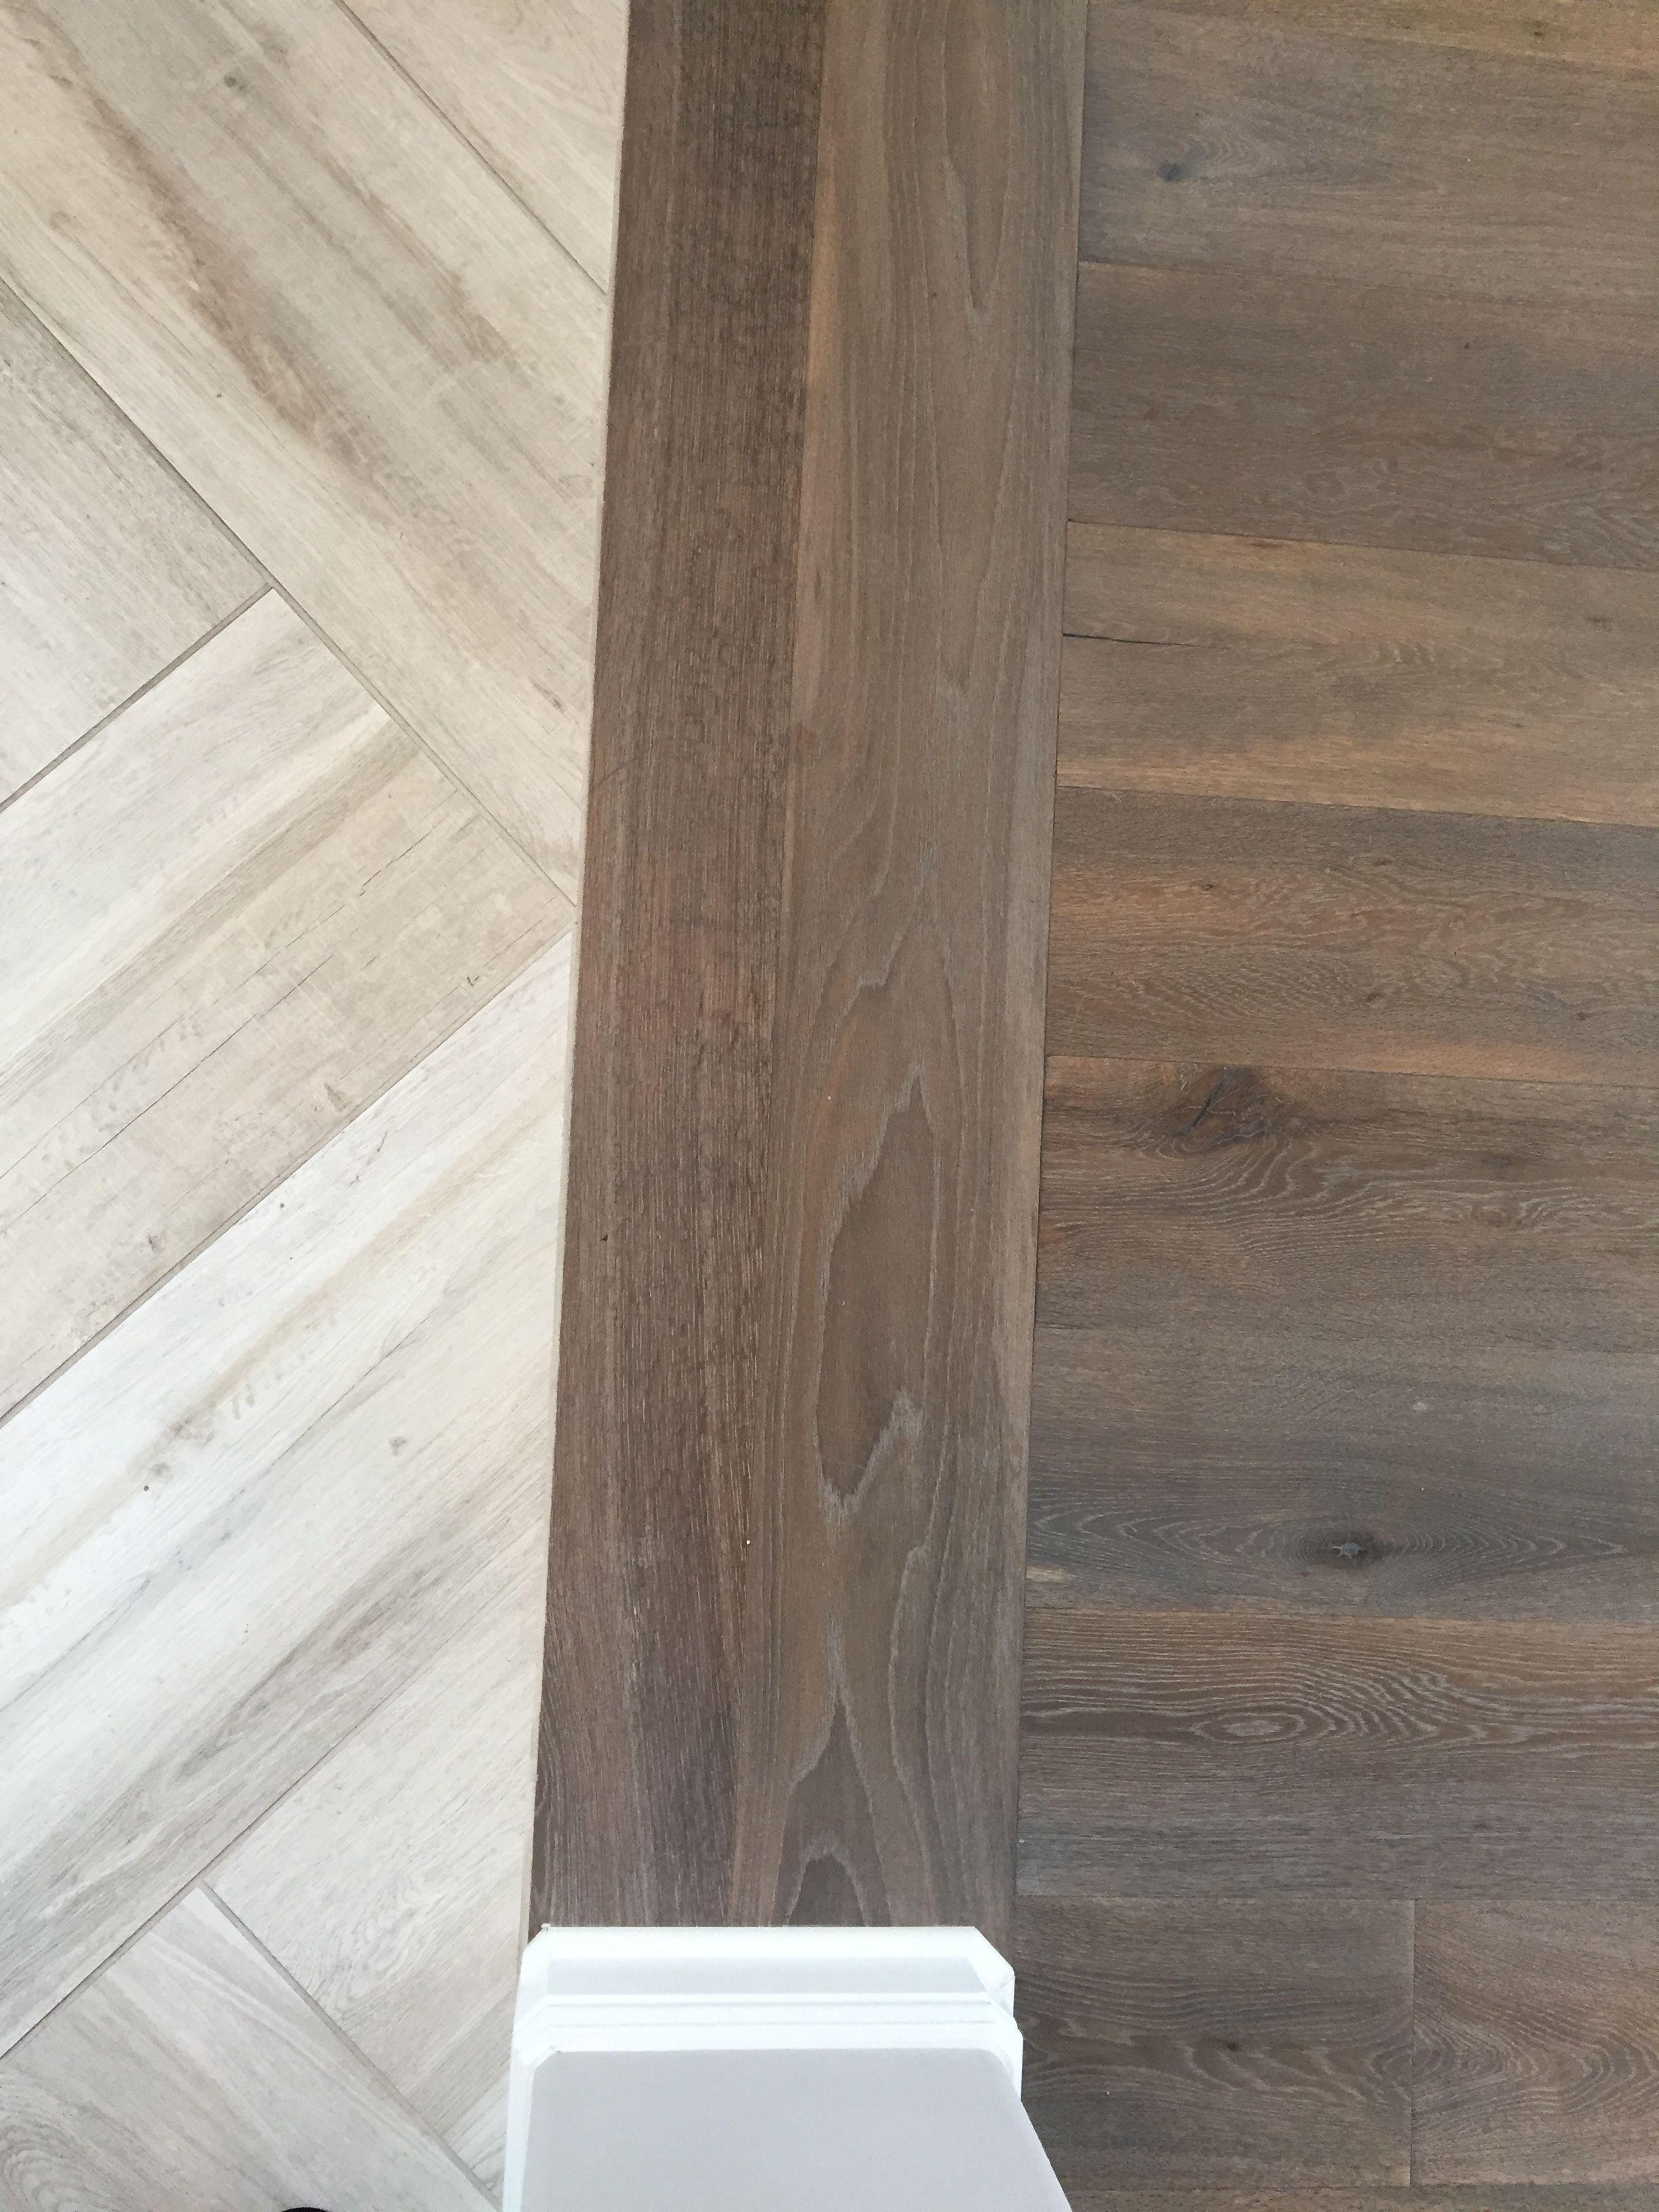 pin by jenifer dun on ceramic floor tiles ideas in 2018 flooring rh pinterest com